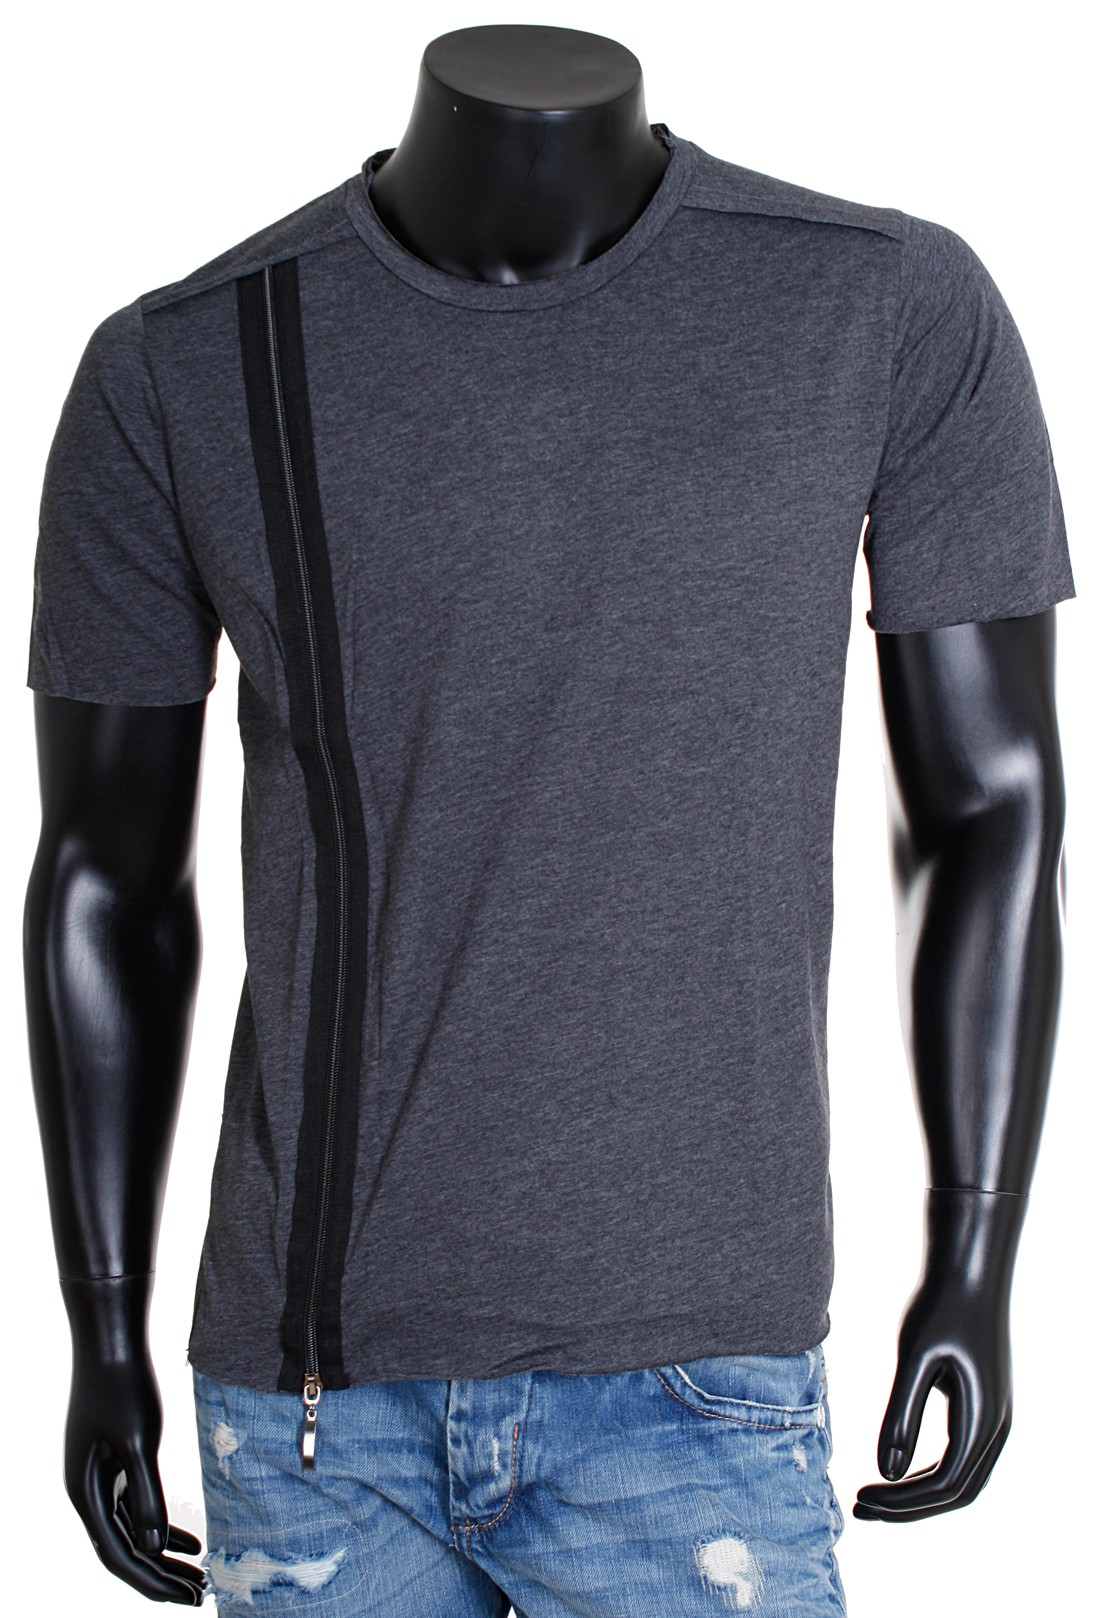 rerock oversized herren t shirt lang longshirt tee mit zipper. Black Bedroom Furniture Sets. Home Design Ideas